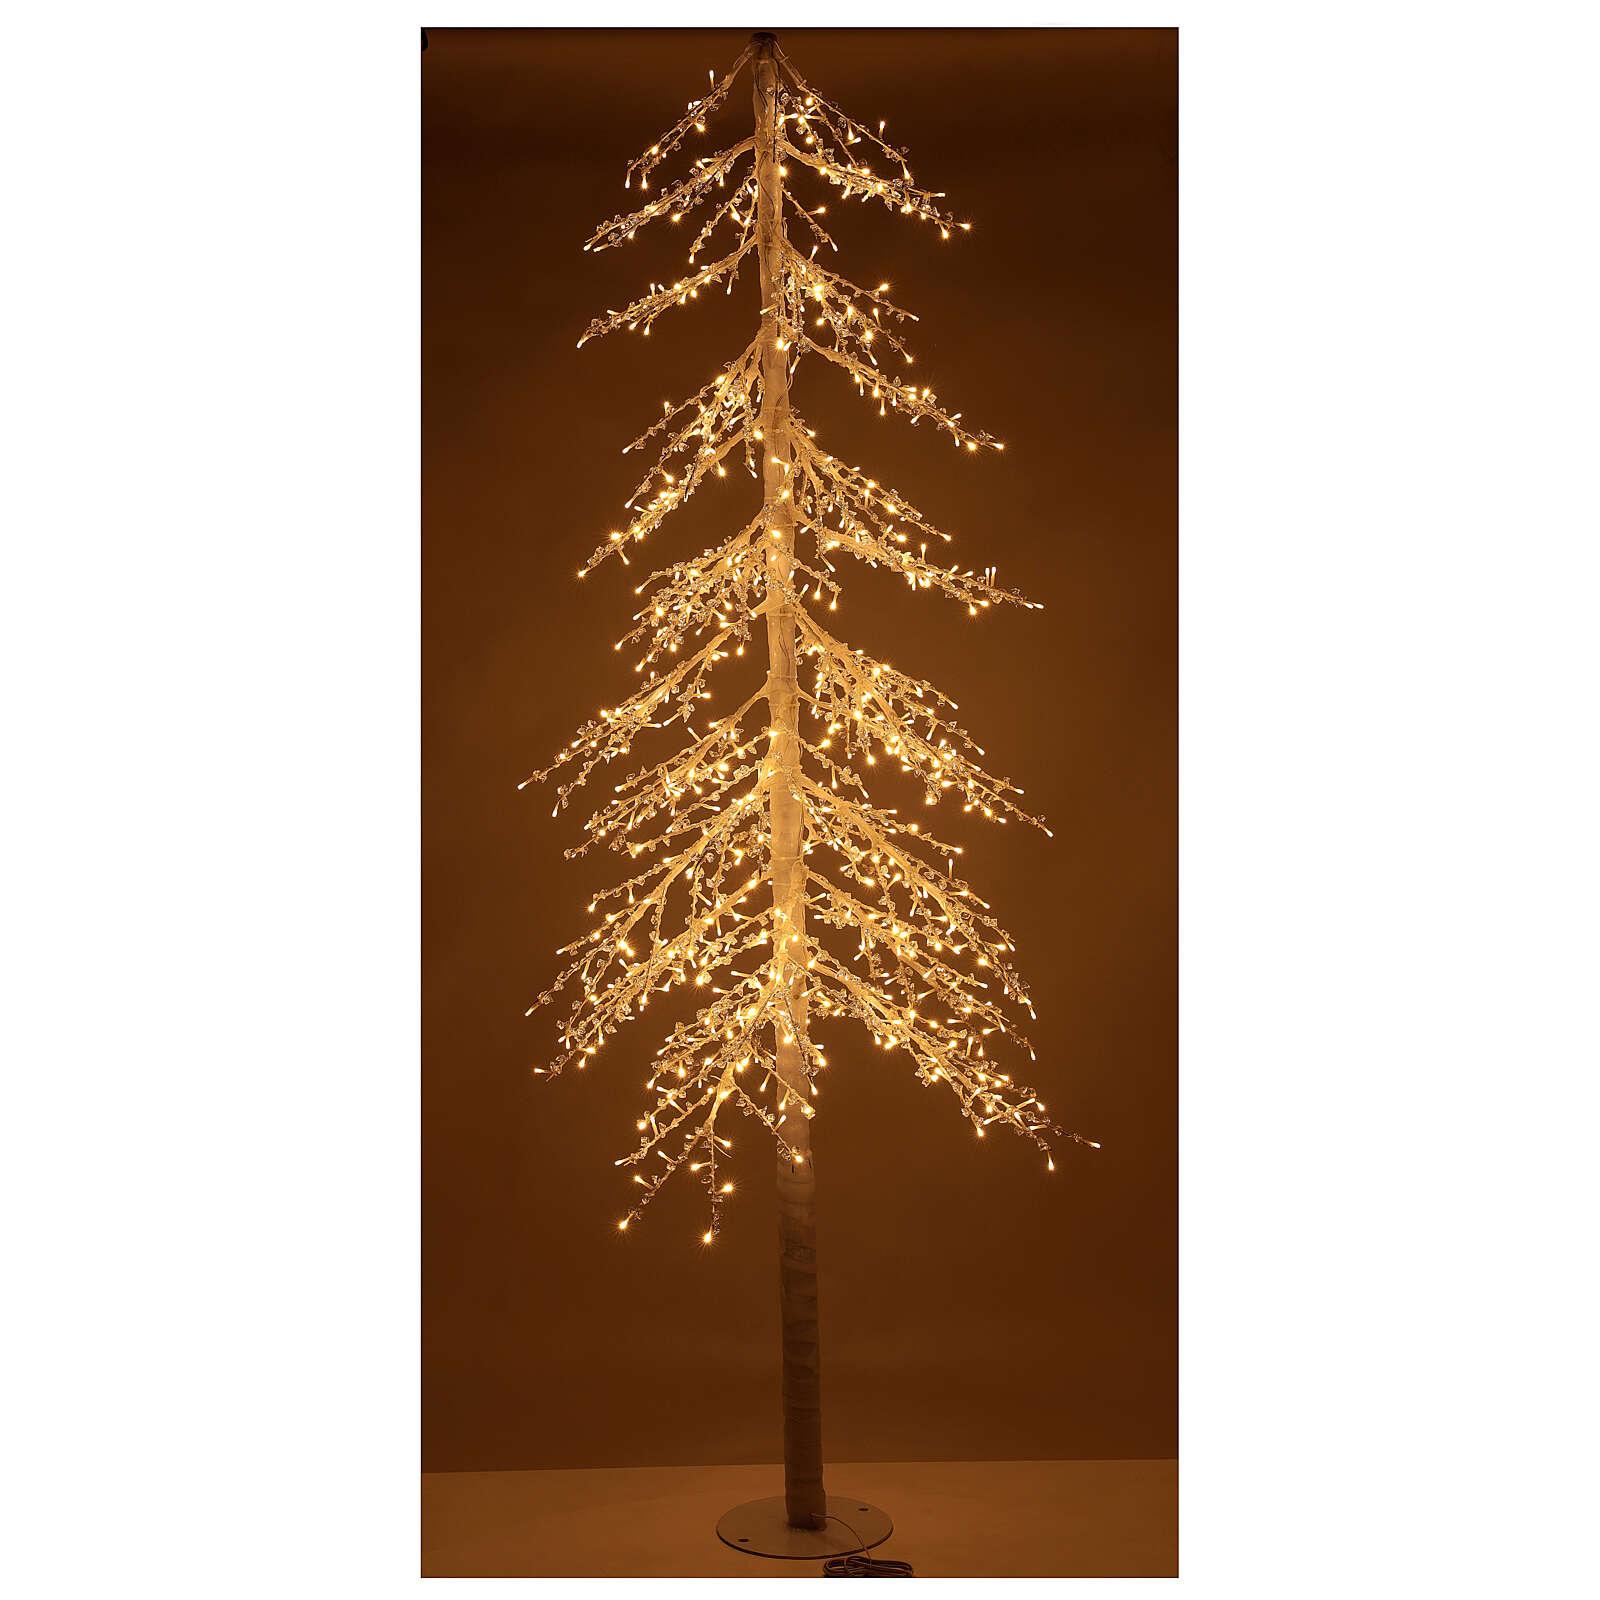 Christmas tree figure Diamond 250 cm 720 warm white LEDs outdoors electric powered 3